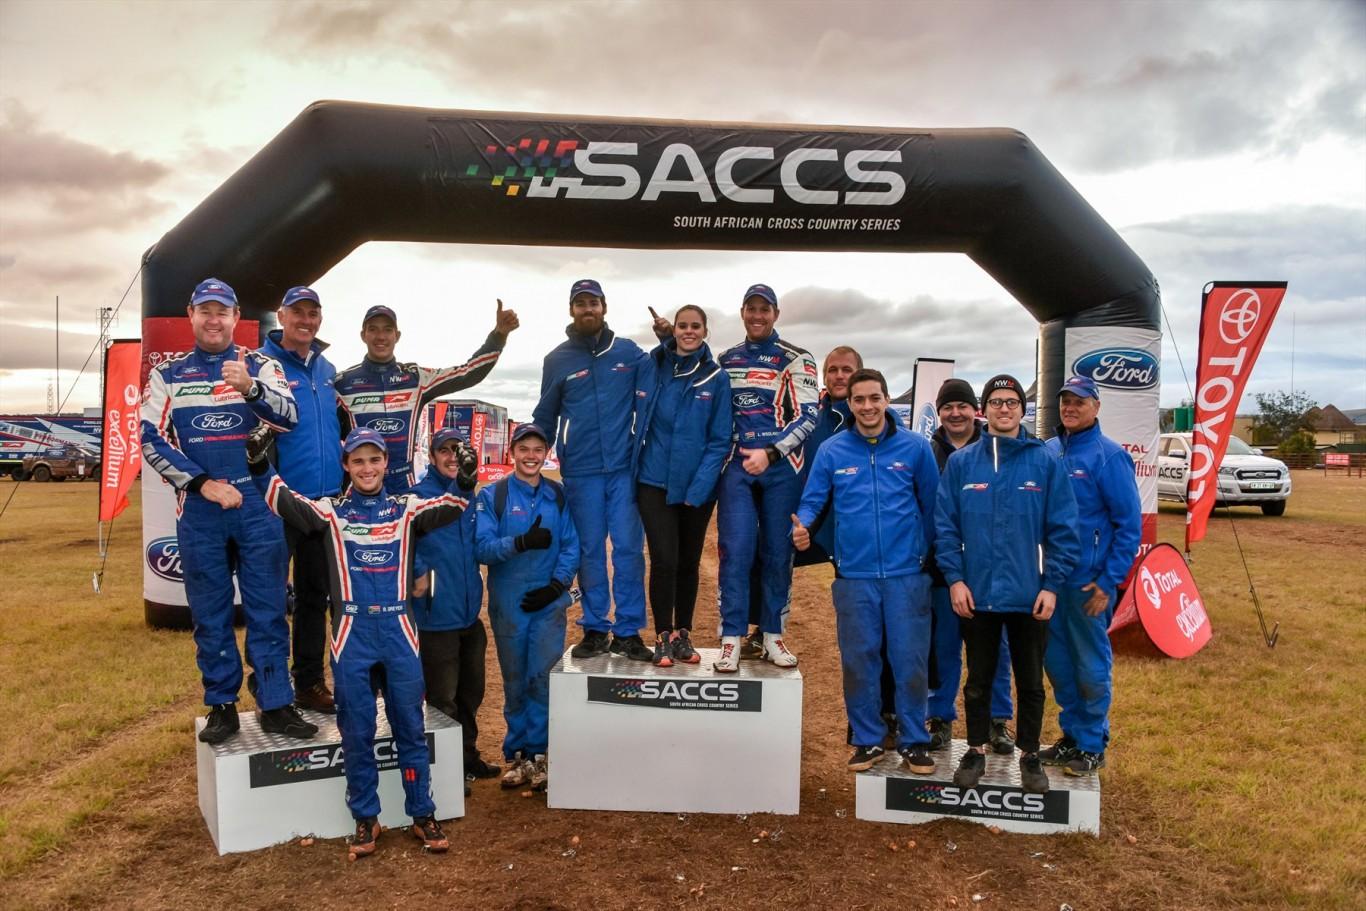 Ford NWM Puma Lubricants team victorious on treacherous Battlefields 400 Cross Country race